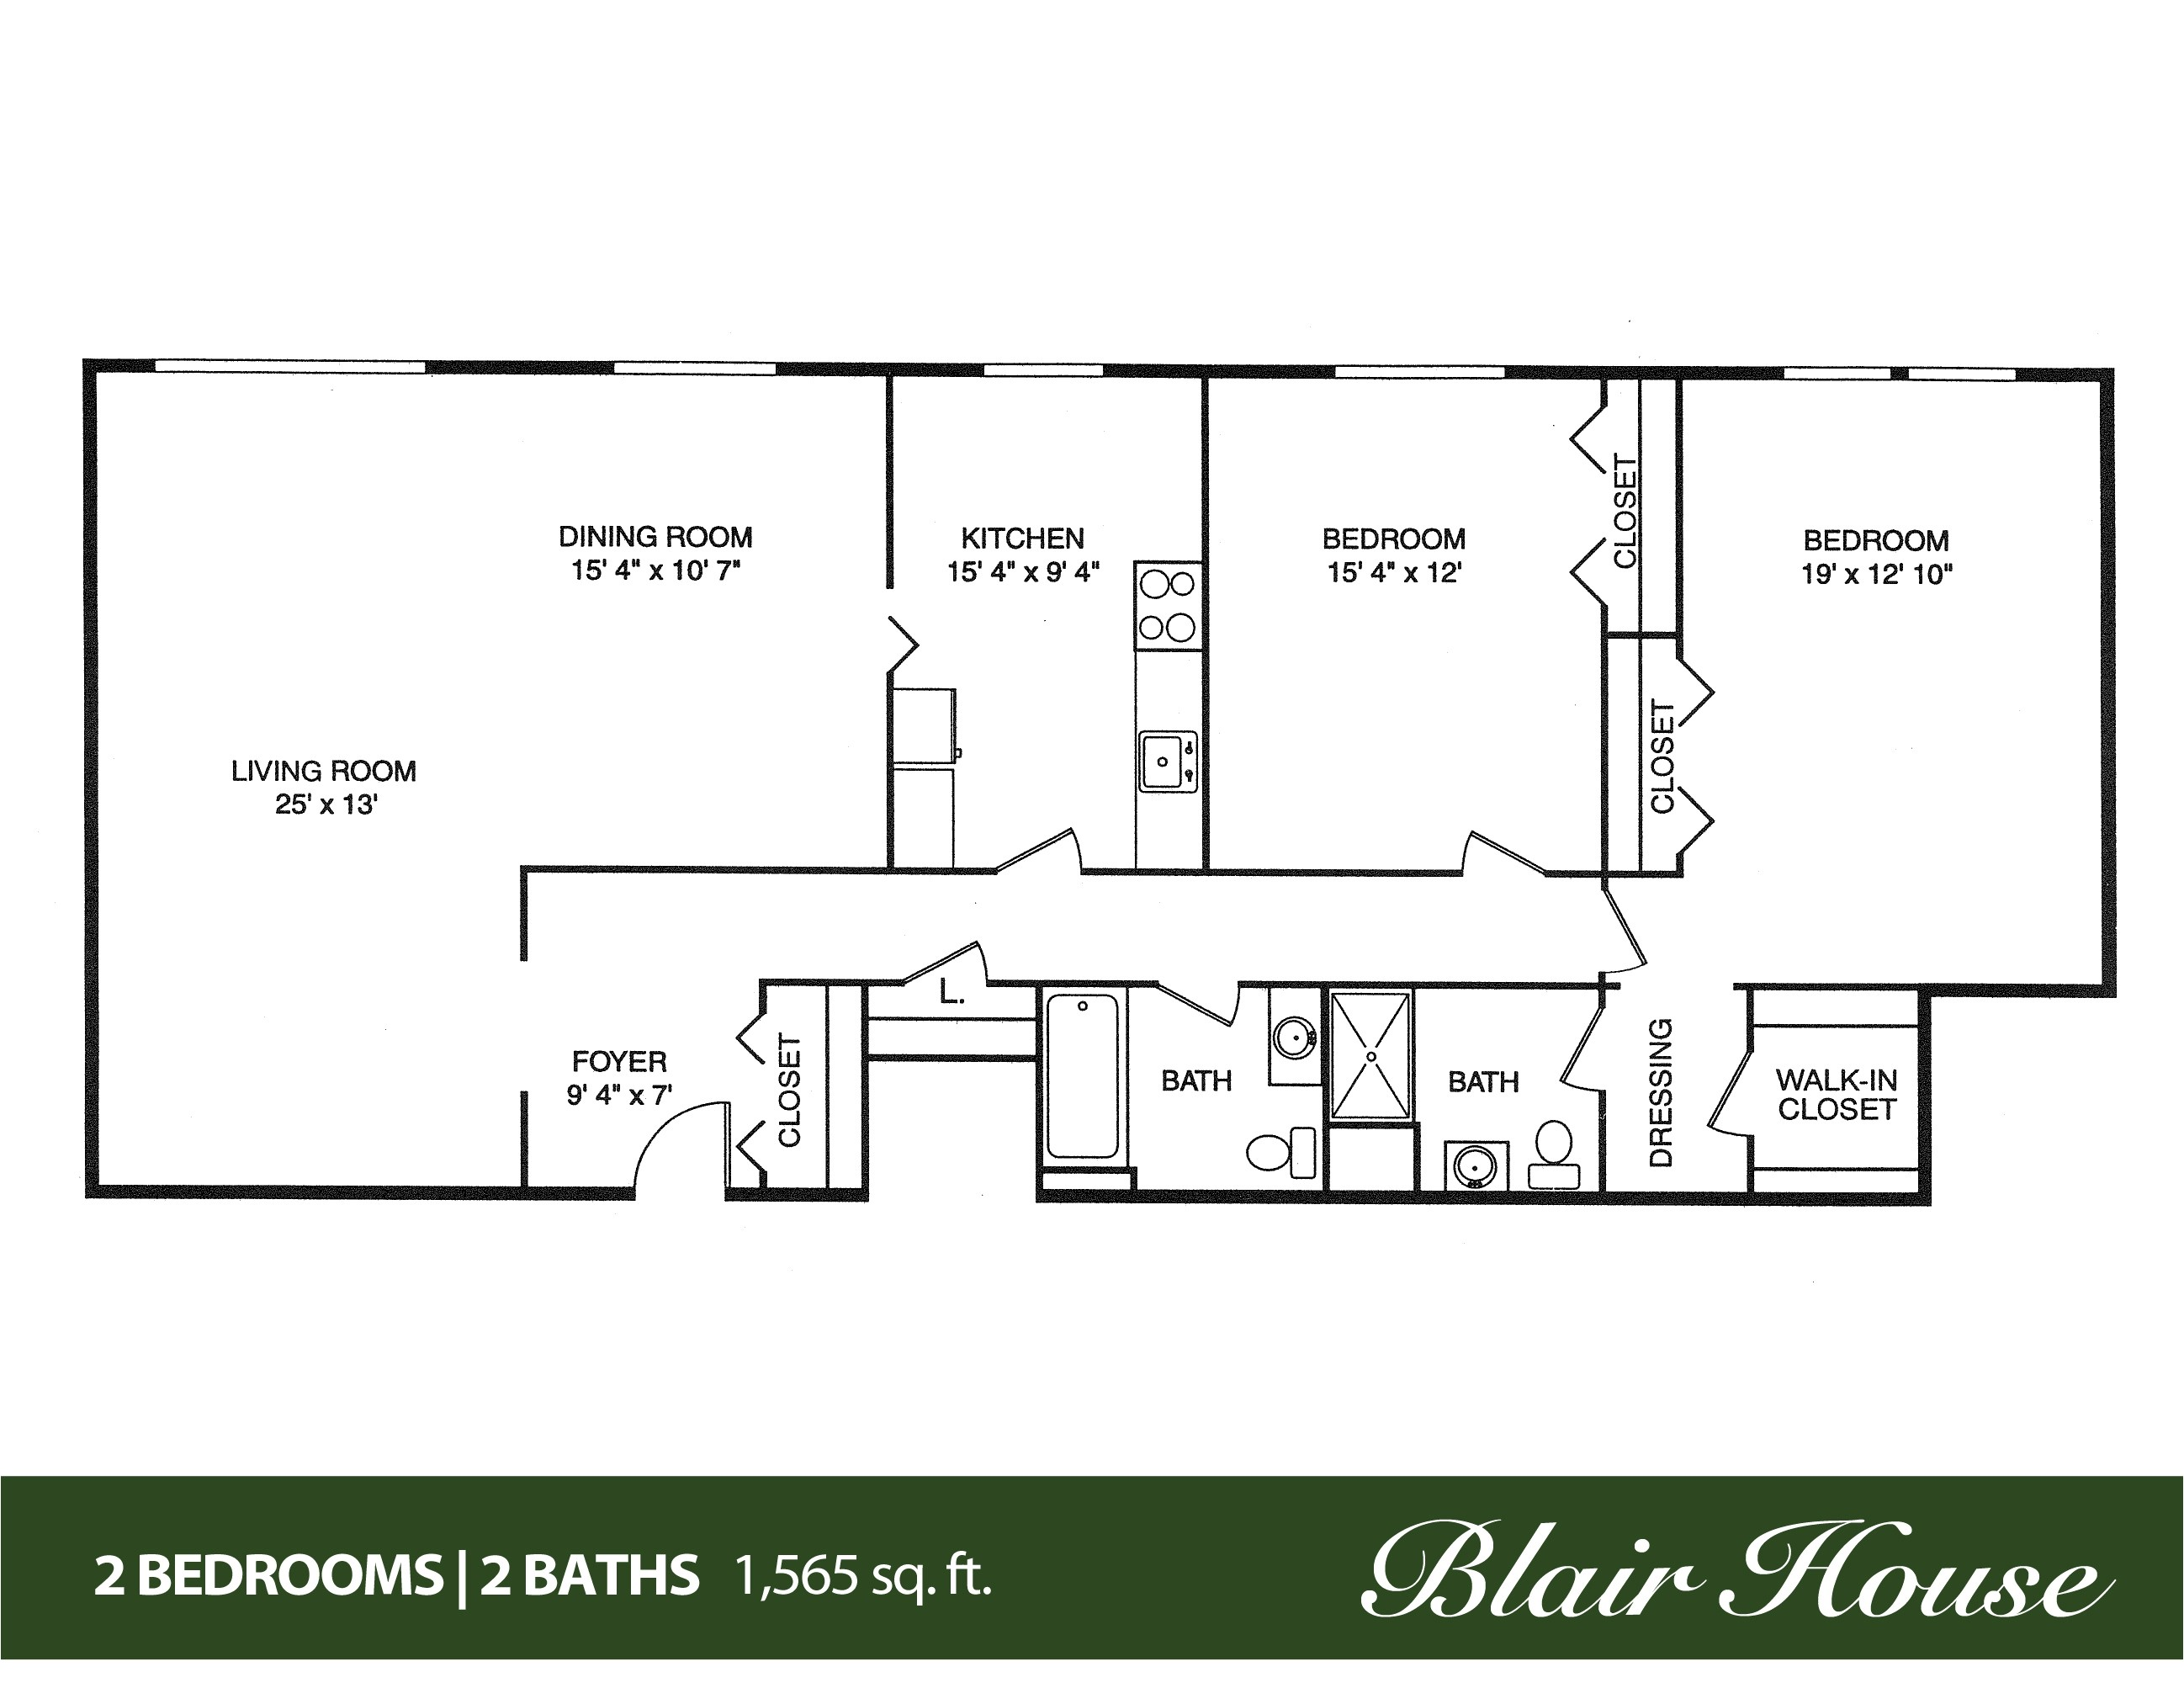 bright house plans lovely rectangular house plans 3 bedroom 2 bath homes zone